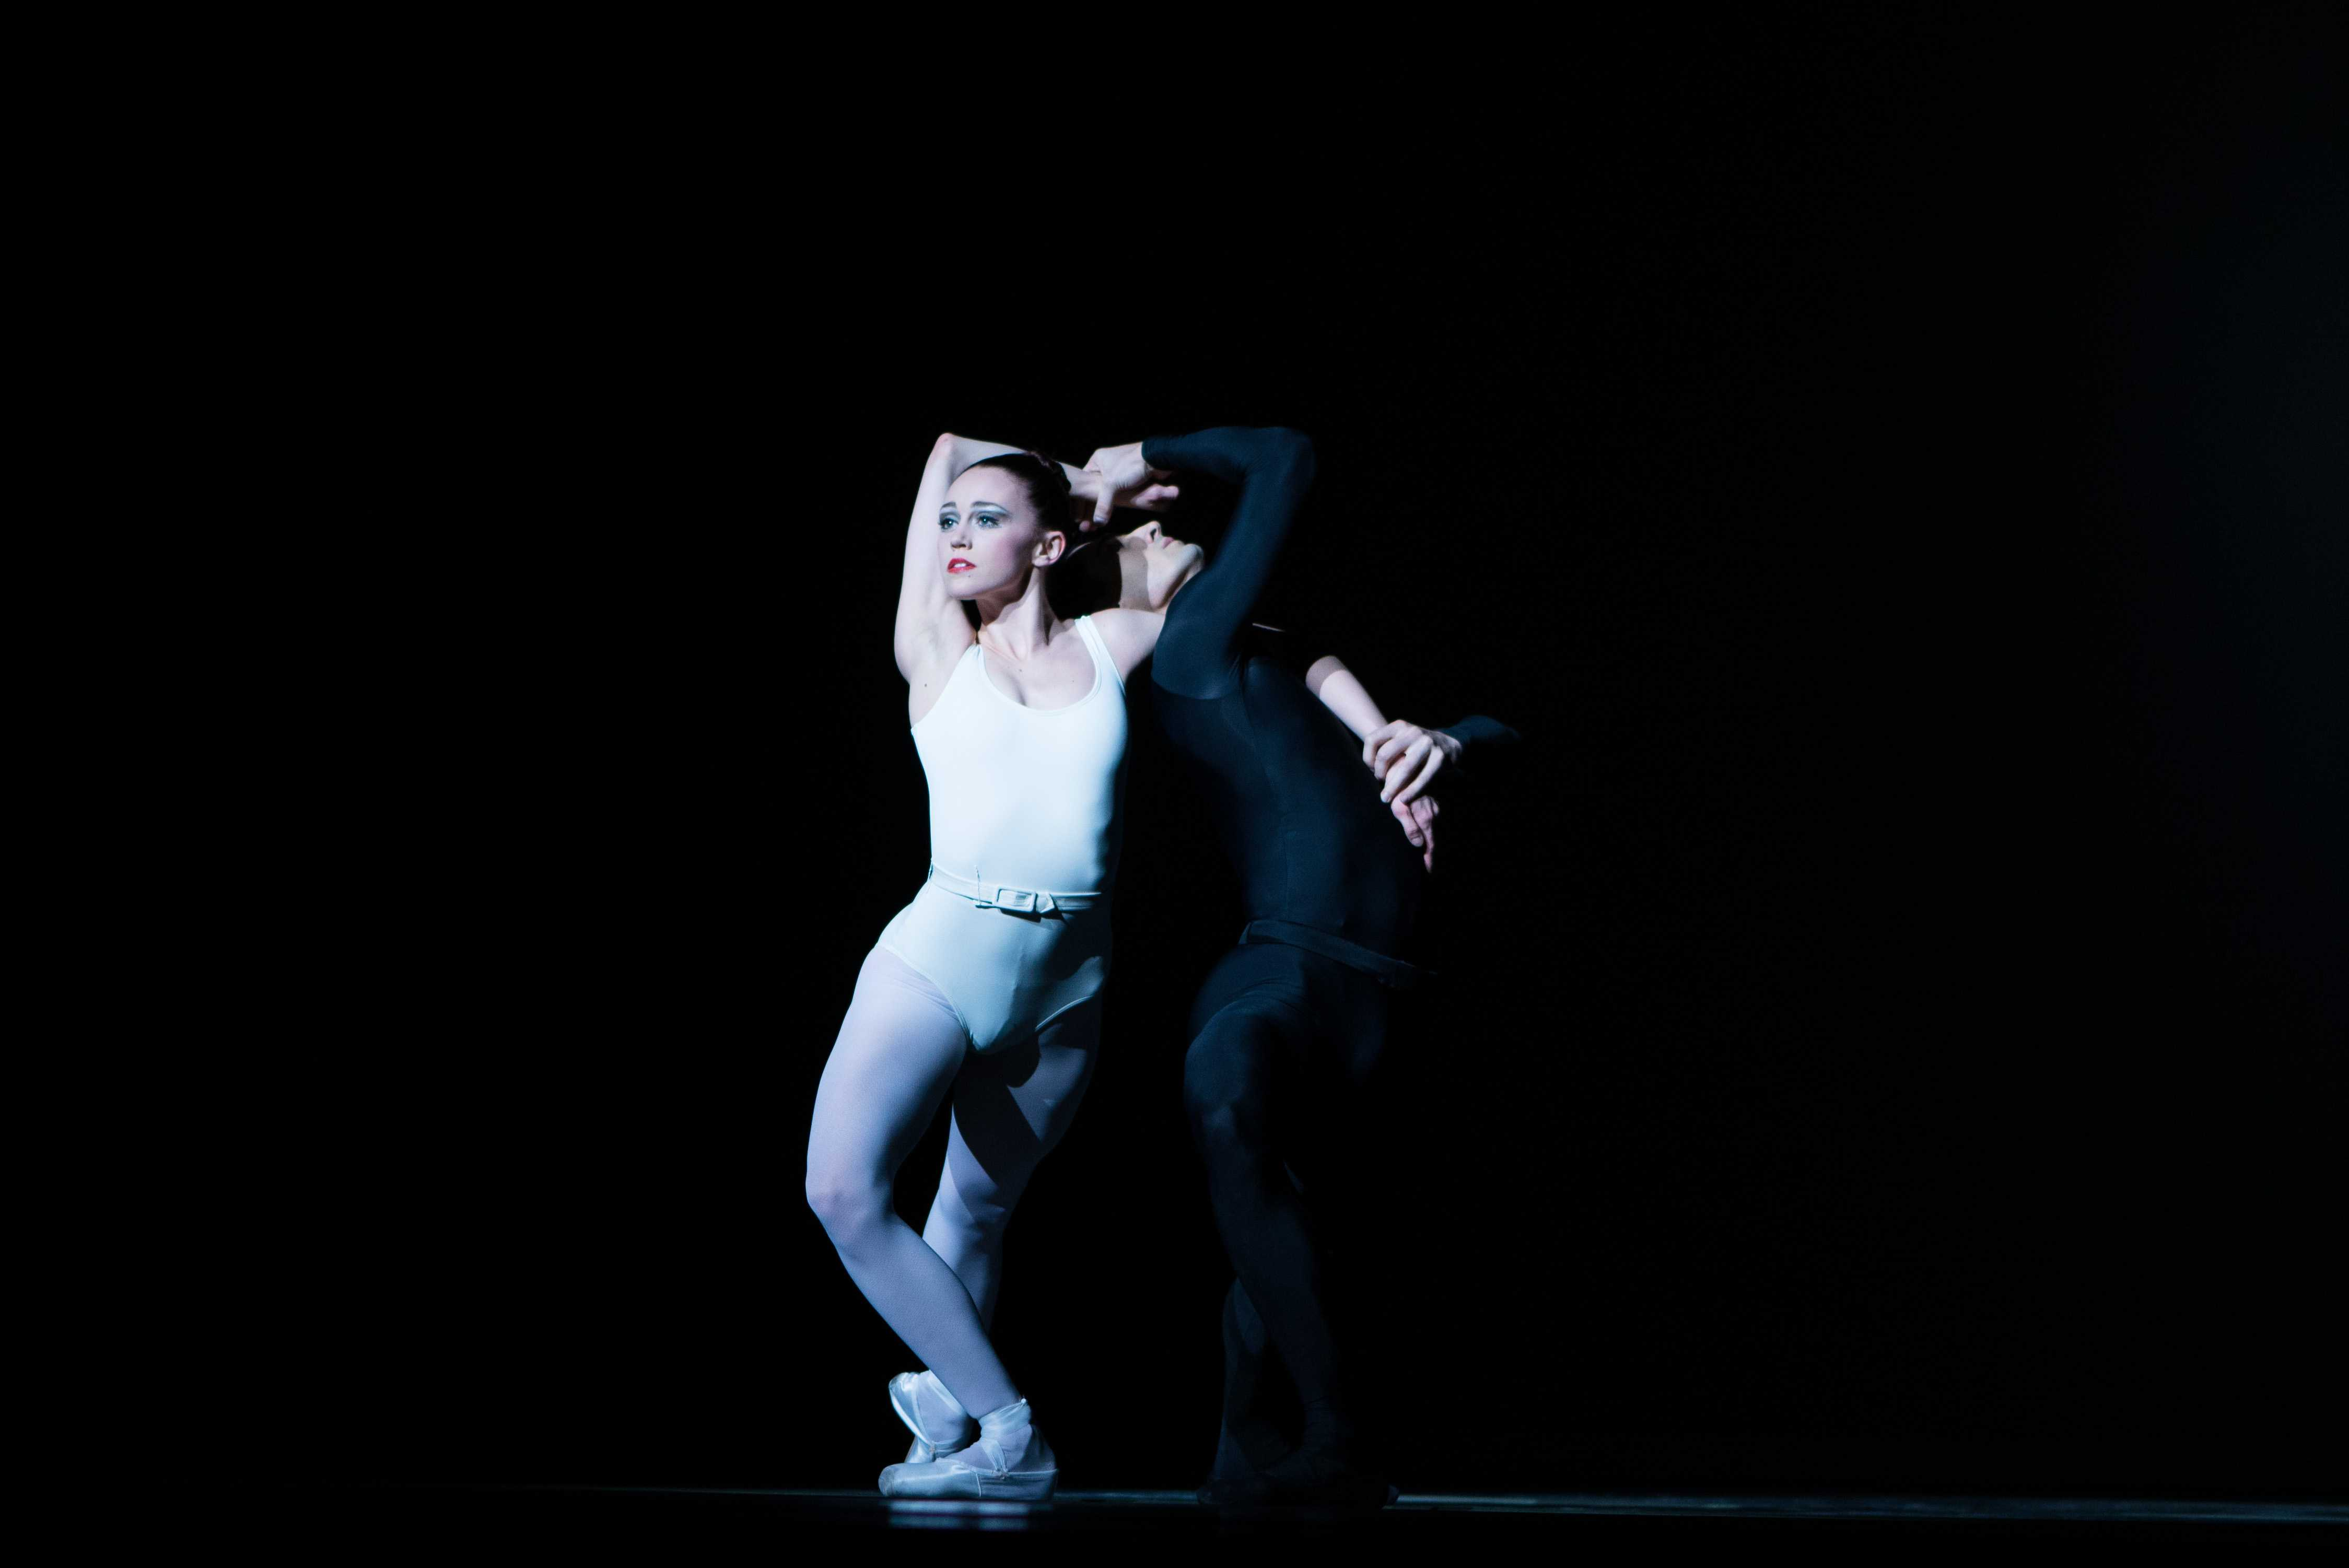 Lasha Khozashvili and Dusty Button perform on stage.